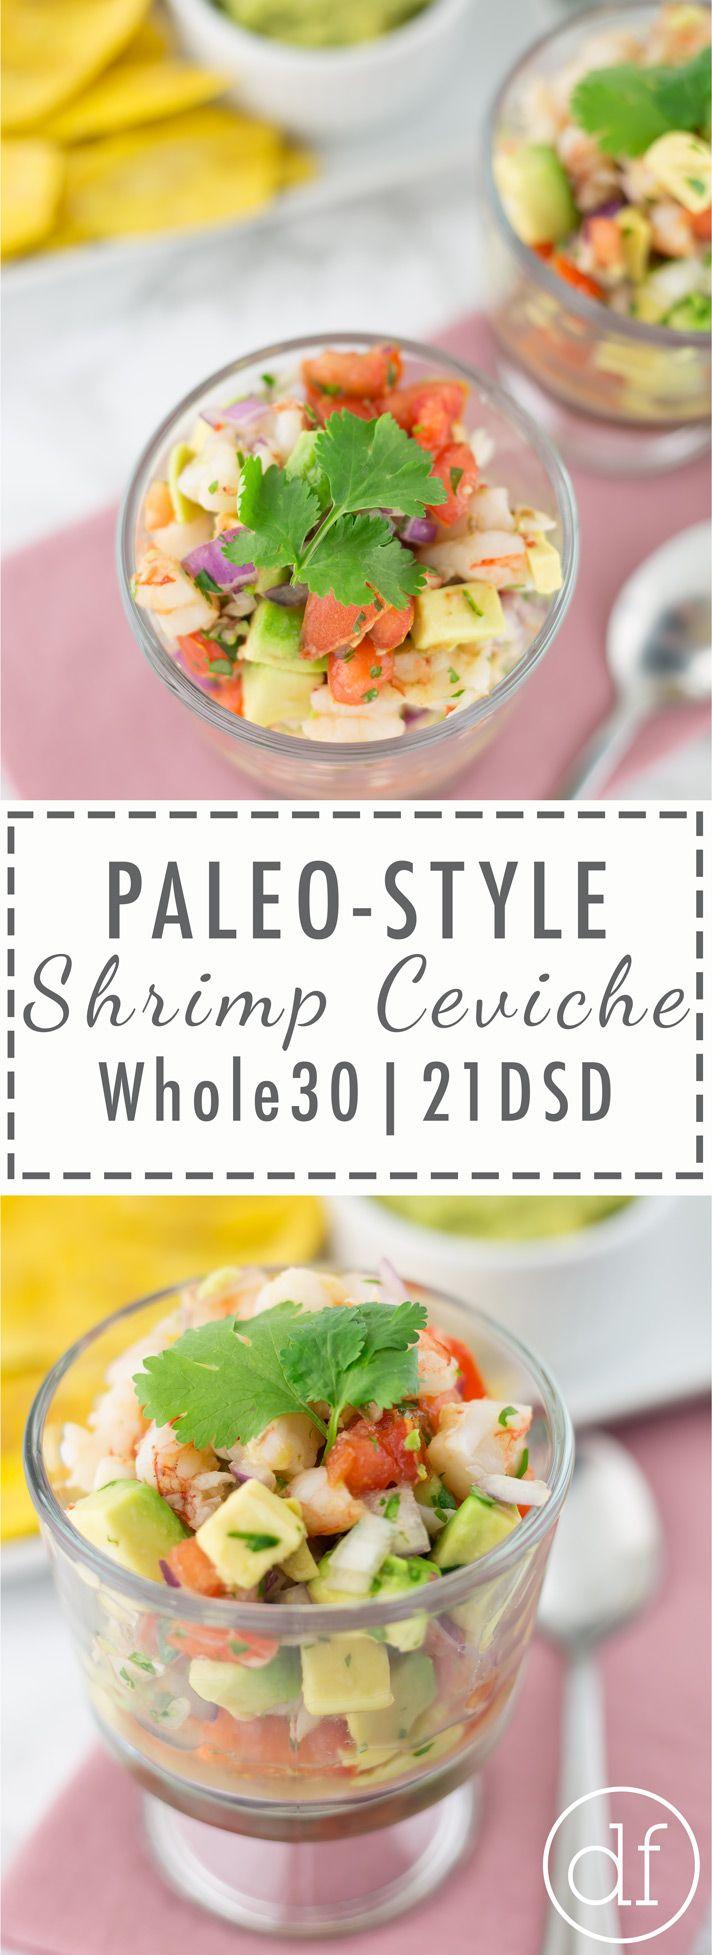 Paleo, Shrimp Ceviche, 21DSD, Whole30, Real Food, Primal, Gluten Free, Grain Free, Dairy Free